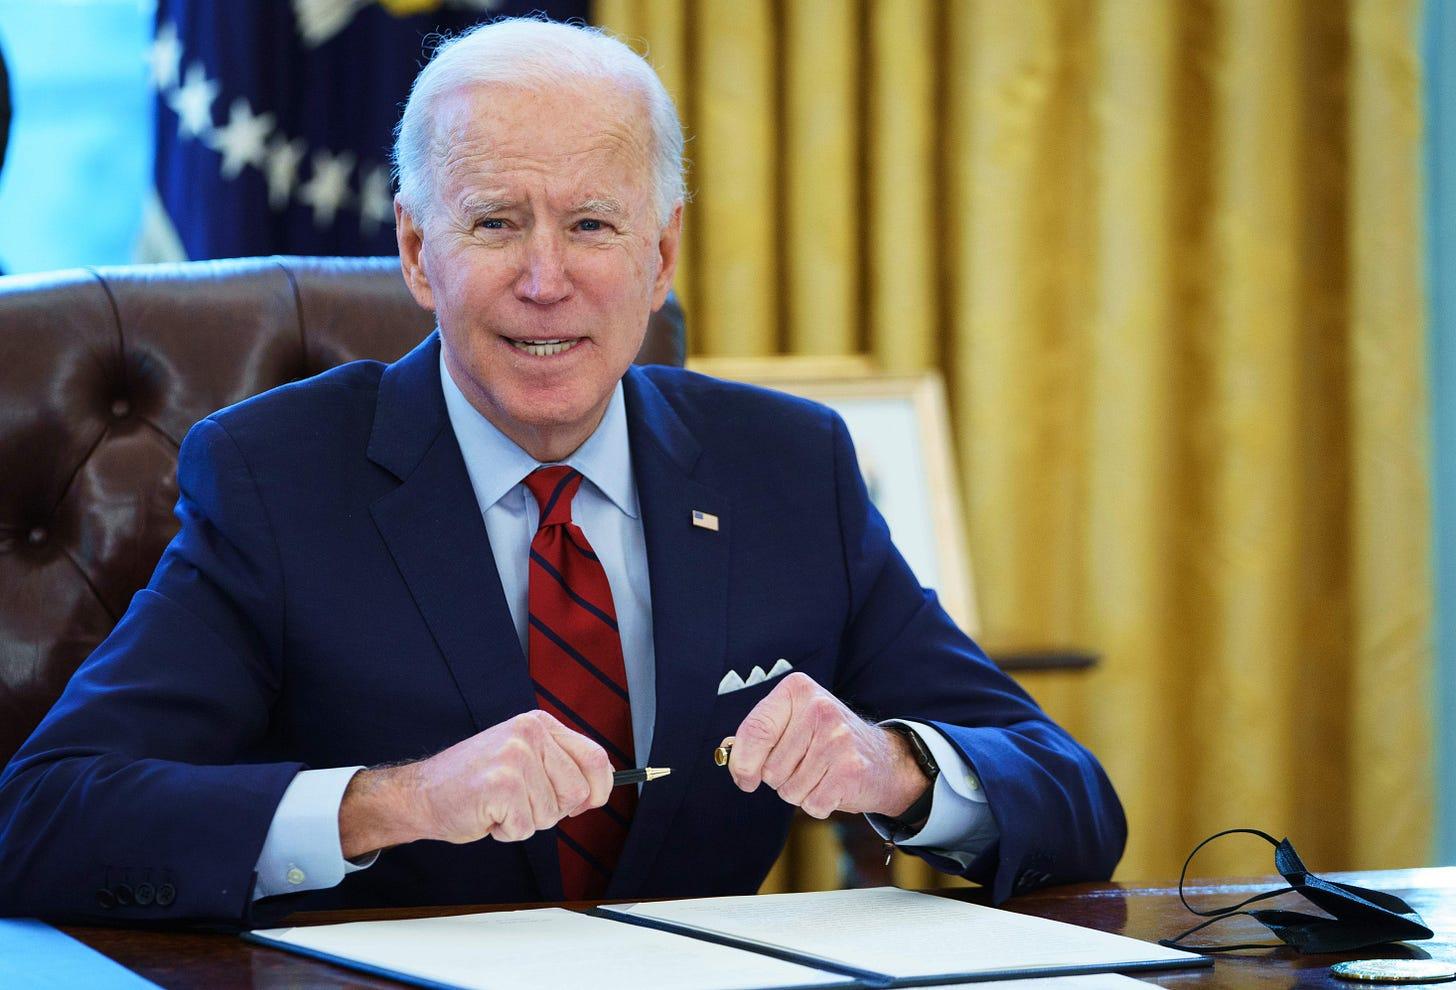 Joe Biden, enjoying his blitz pen on January 28, 2021. (Photo: Getty Images)